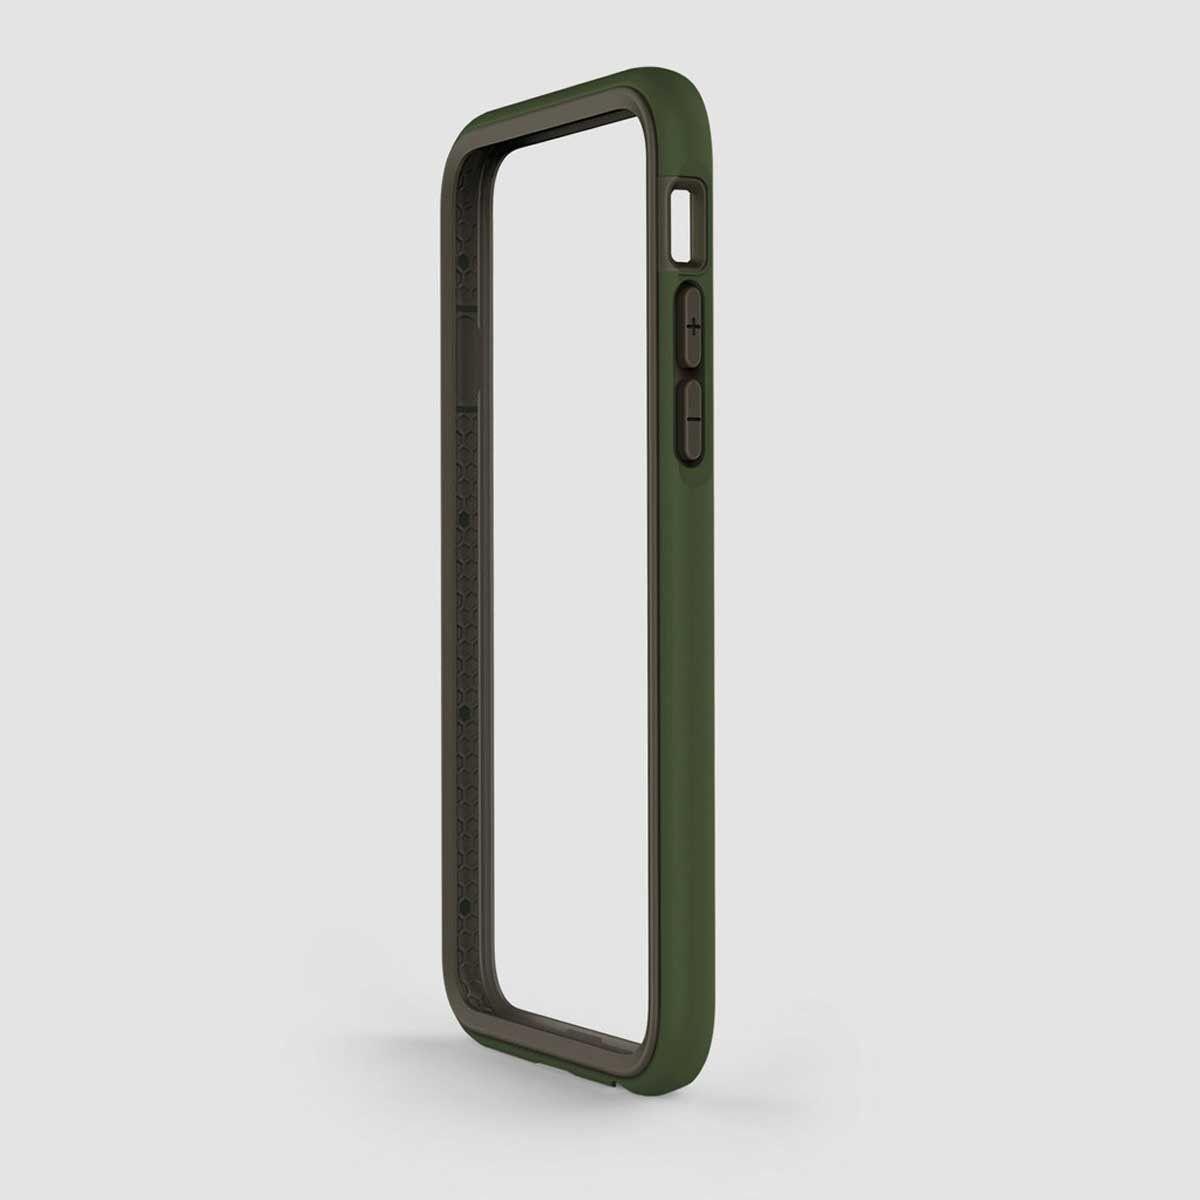 RhinoShield Crash Guard Impact Bumper for iPhone 6 (Includes bumper, and back screen protector)